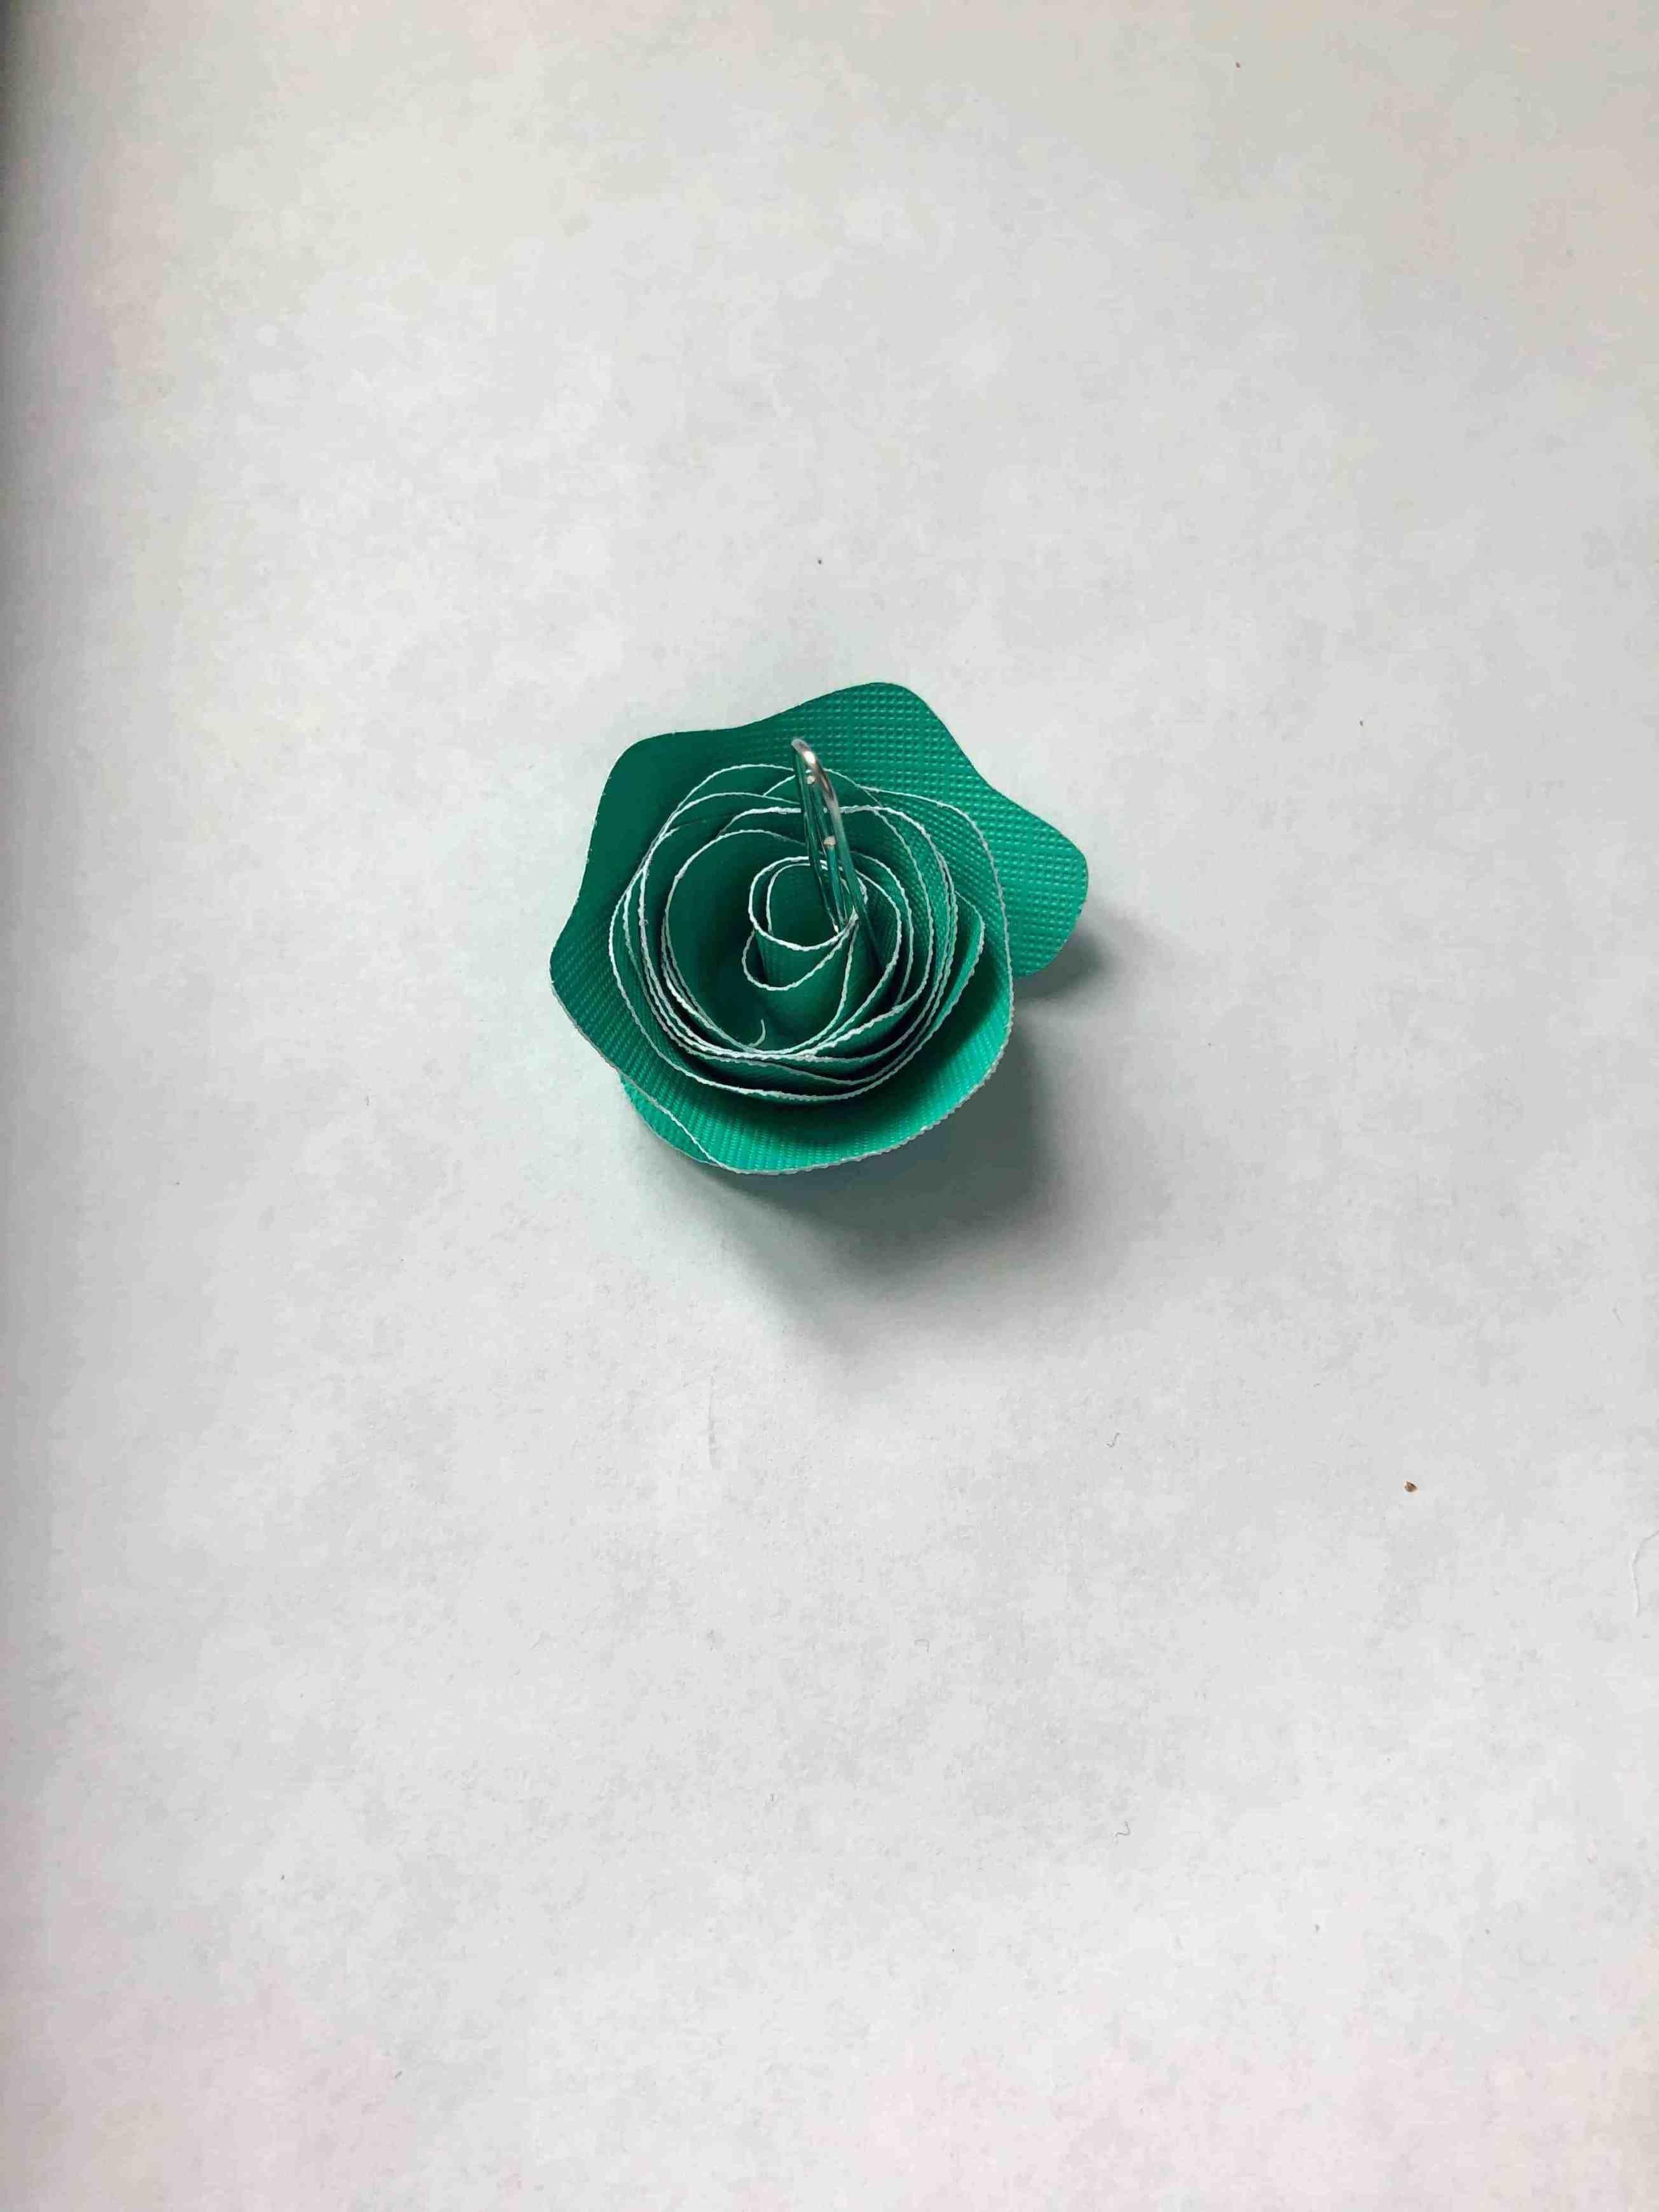 12 Free Rolled Flower Svg Templates Diy 3d Paper Flowers 3d